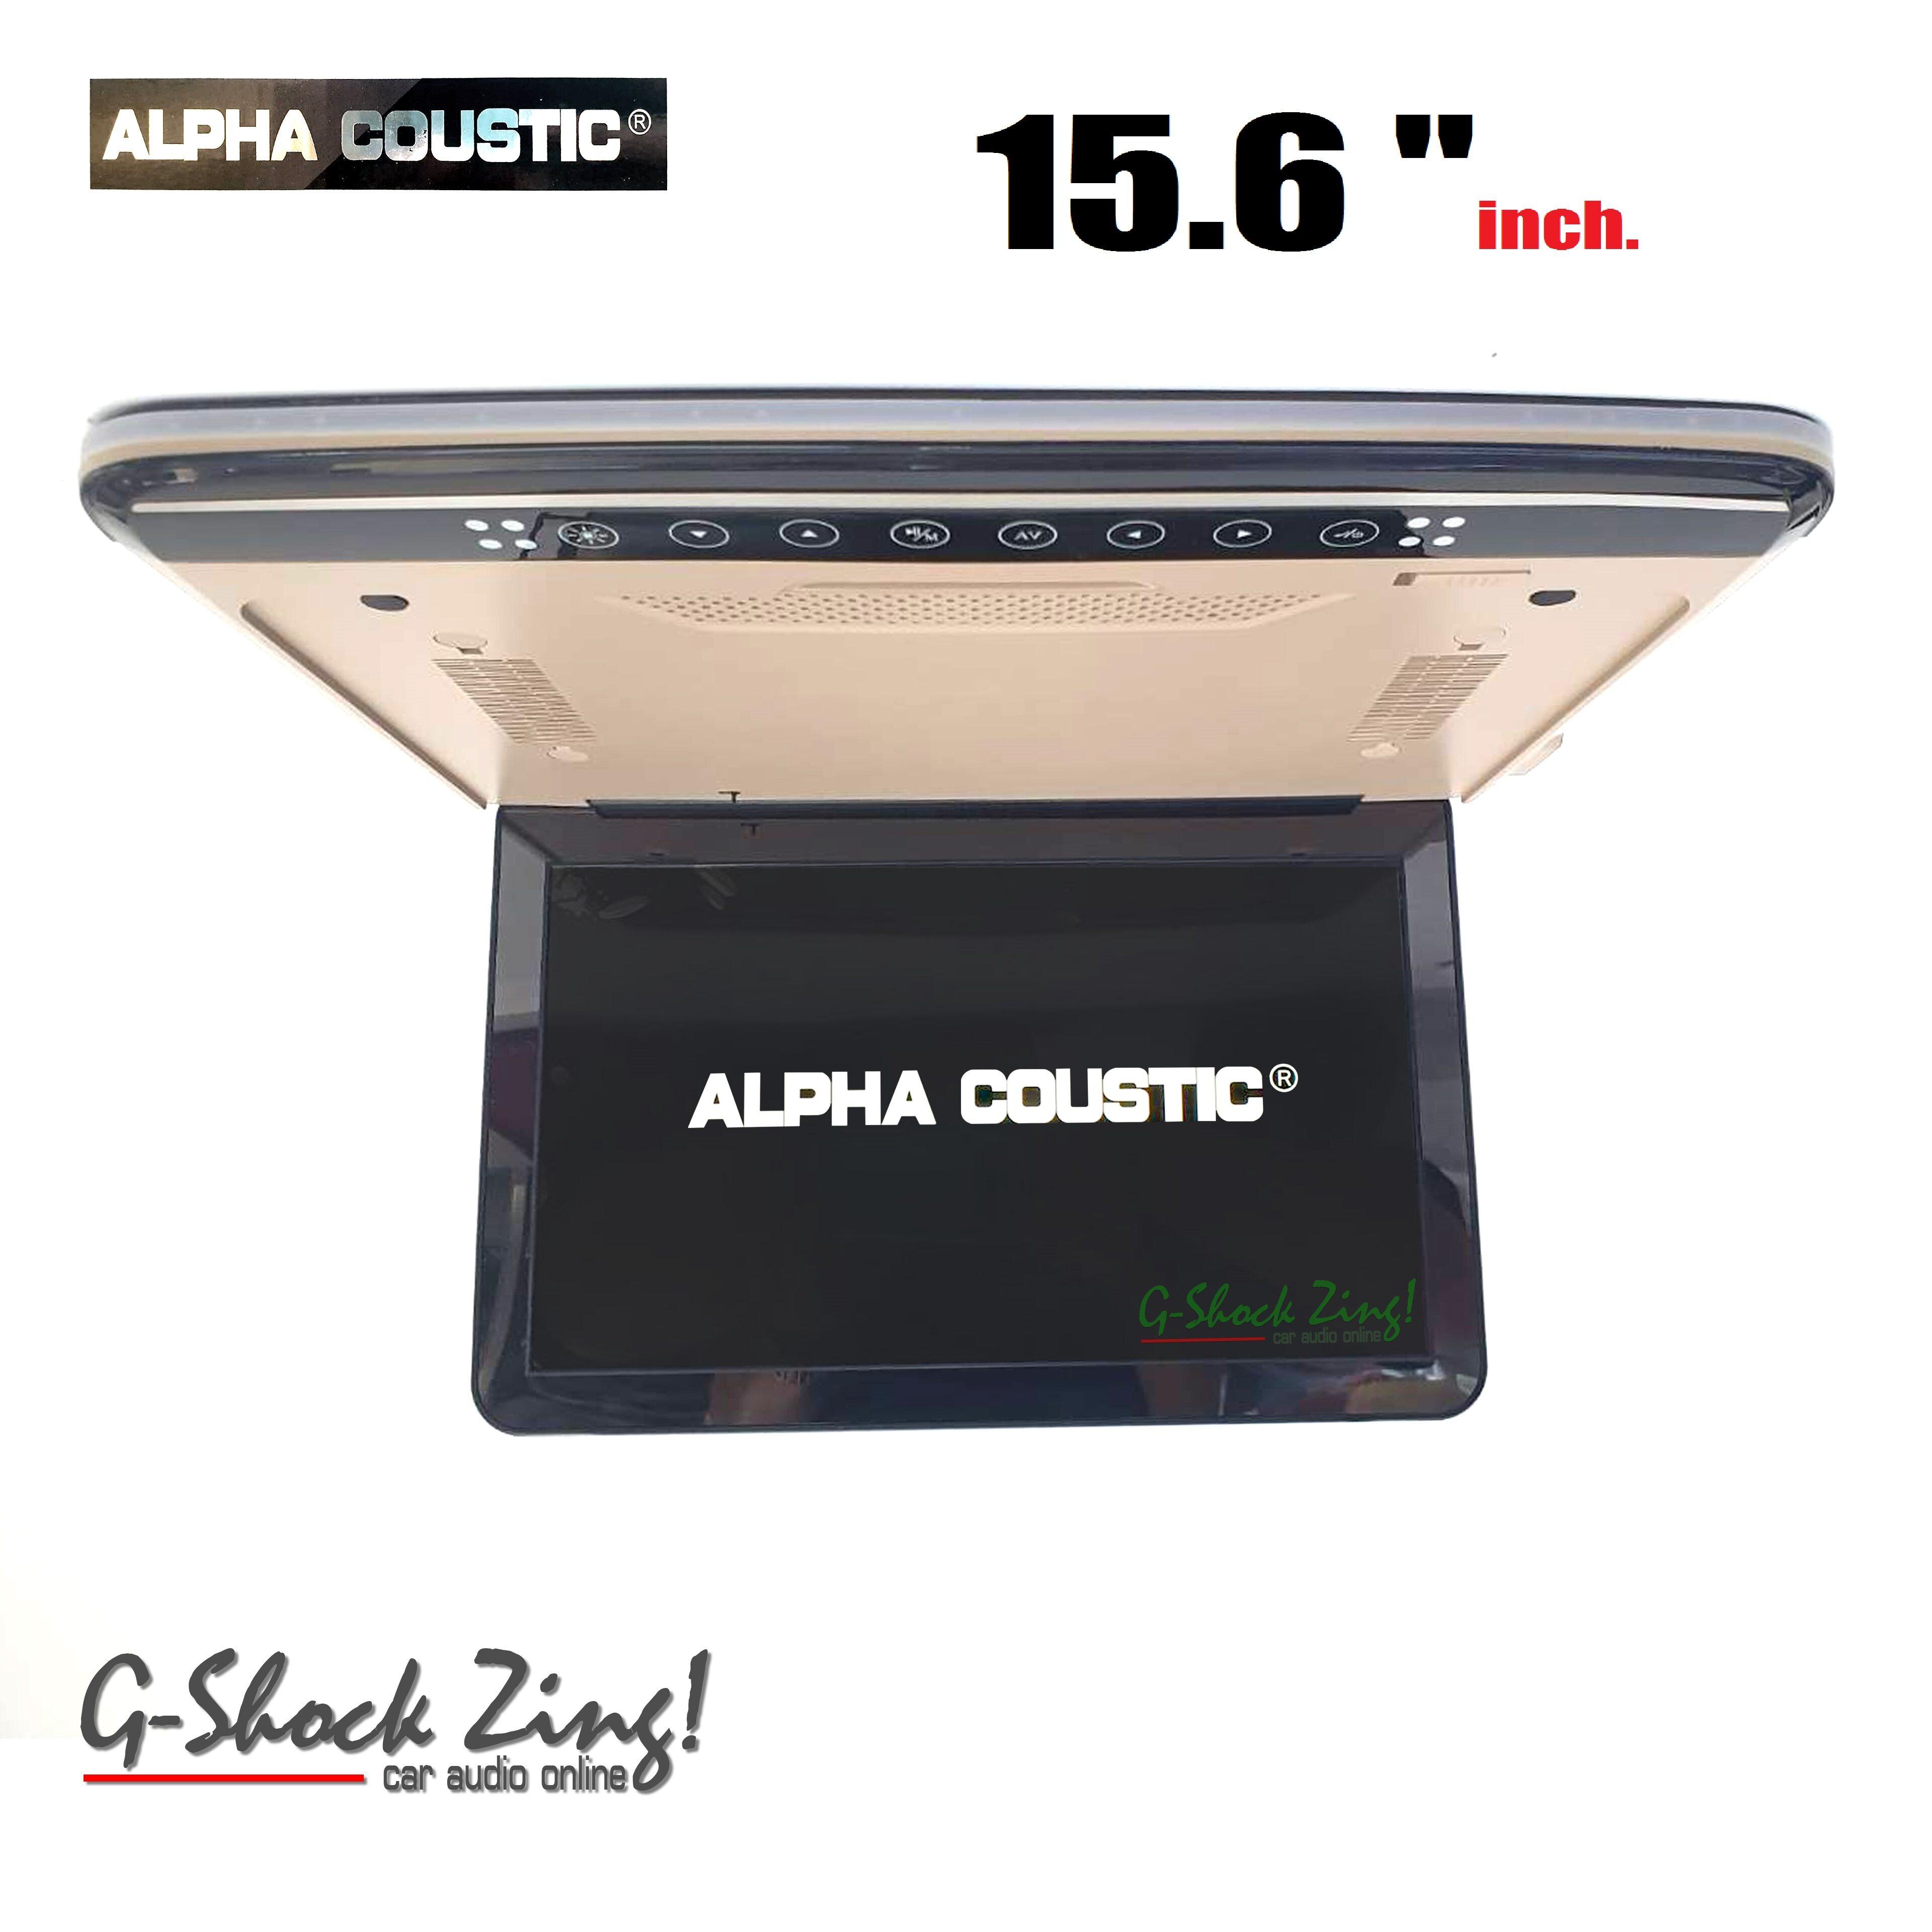 Alpha Coustic Roofmount Monitor เครื่องเสียงรถยนต์/จอเพดานติดรถยนต์ ขนาดจอ 15.6นิ้ว Hdmi In /usb Slot/sd Slot (สี Beige).